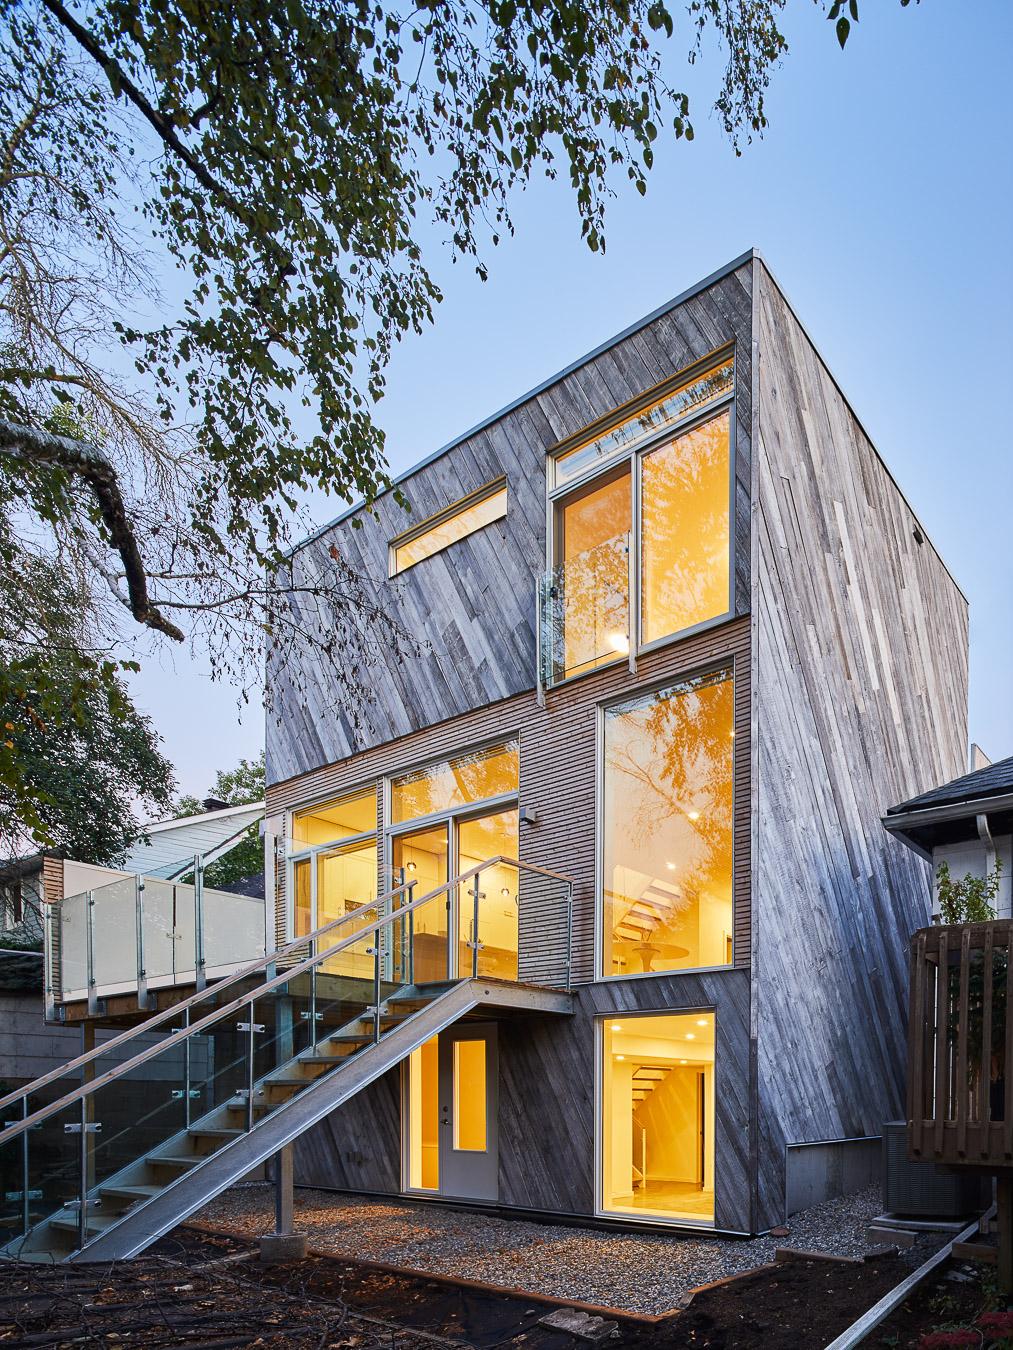 003-Shean Architects Fentiman.jpg